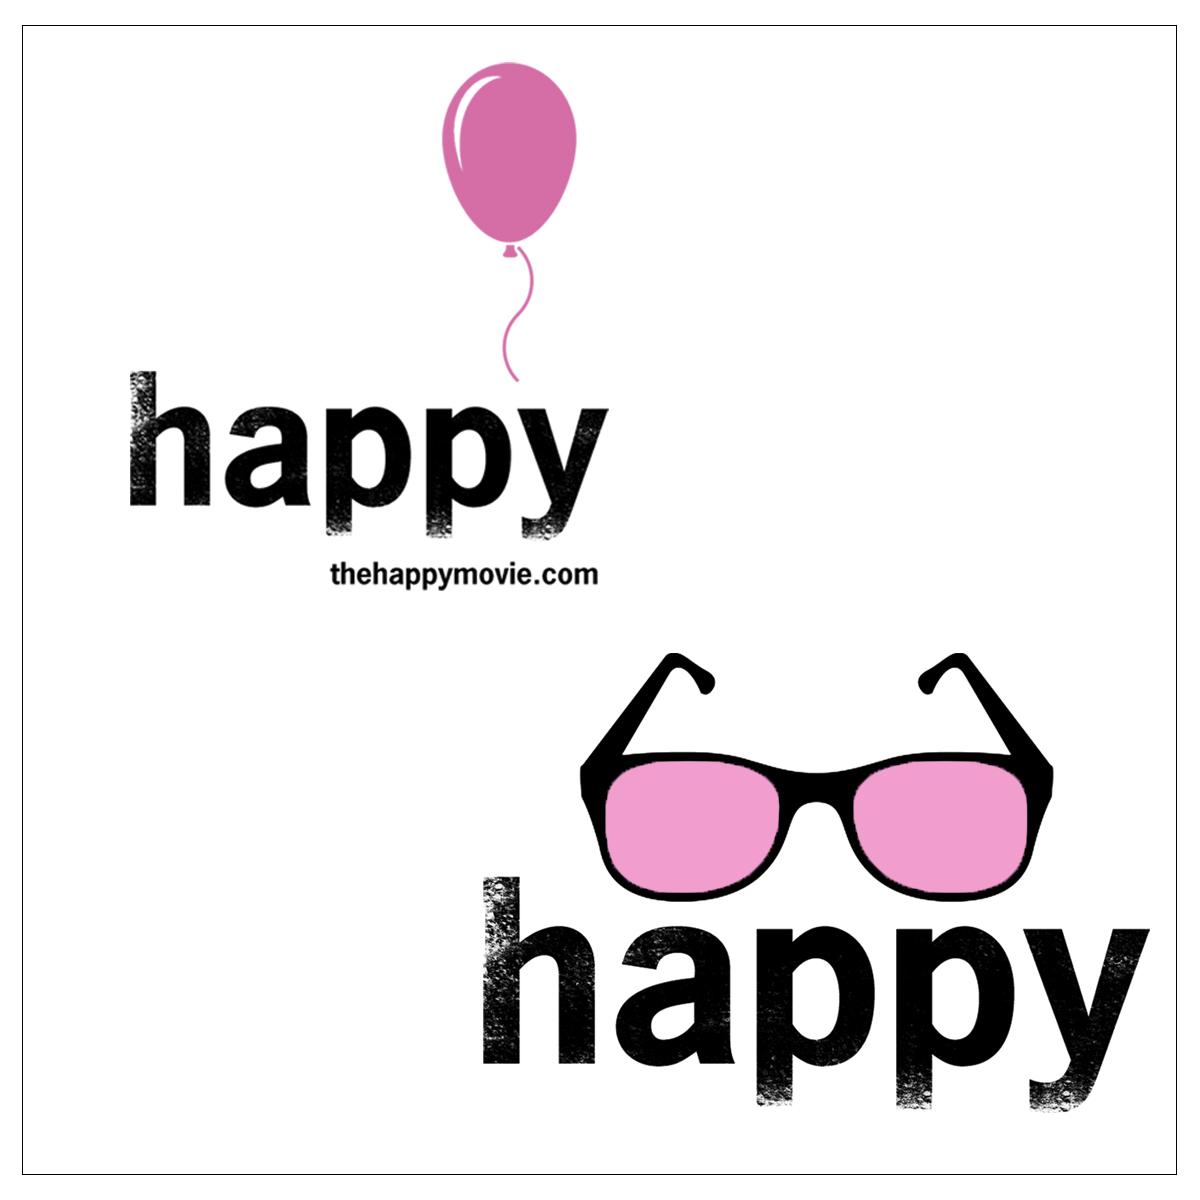 happy_documentarylogos.jpg